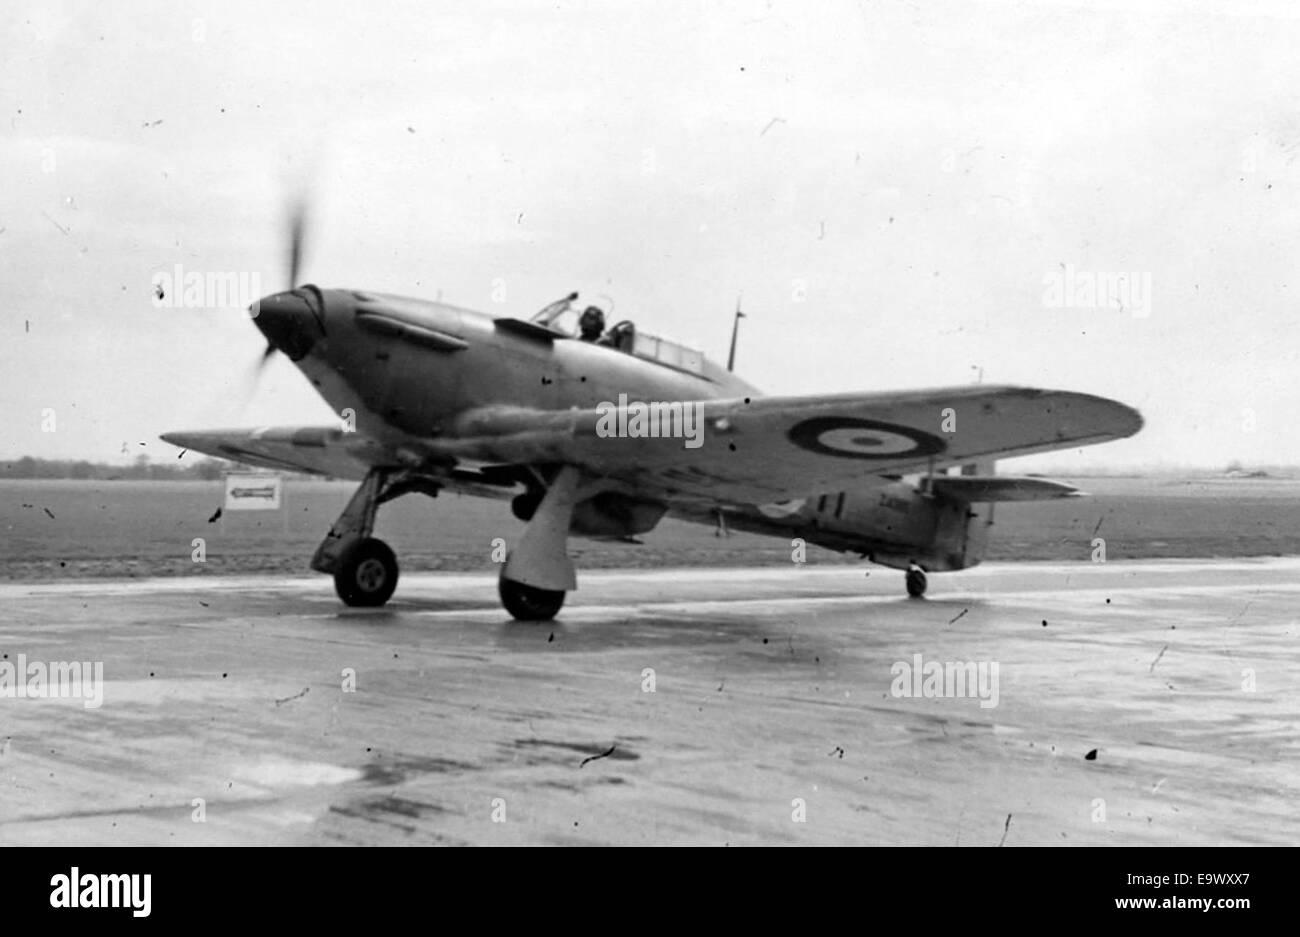 Fleet Air Arm Sea Hurricane fighter of WW11 - Stock Image